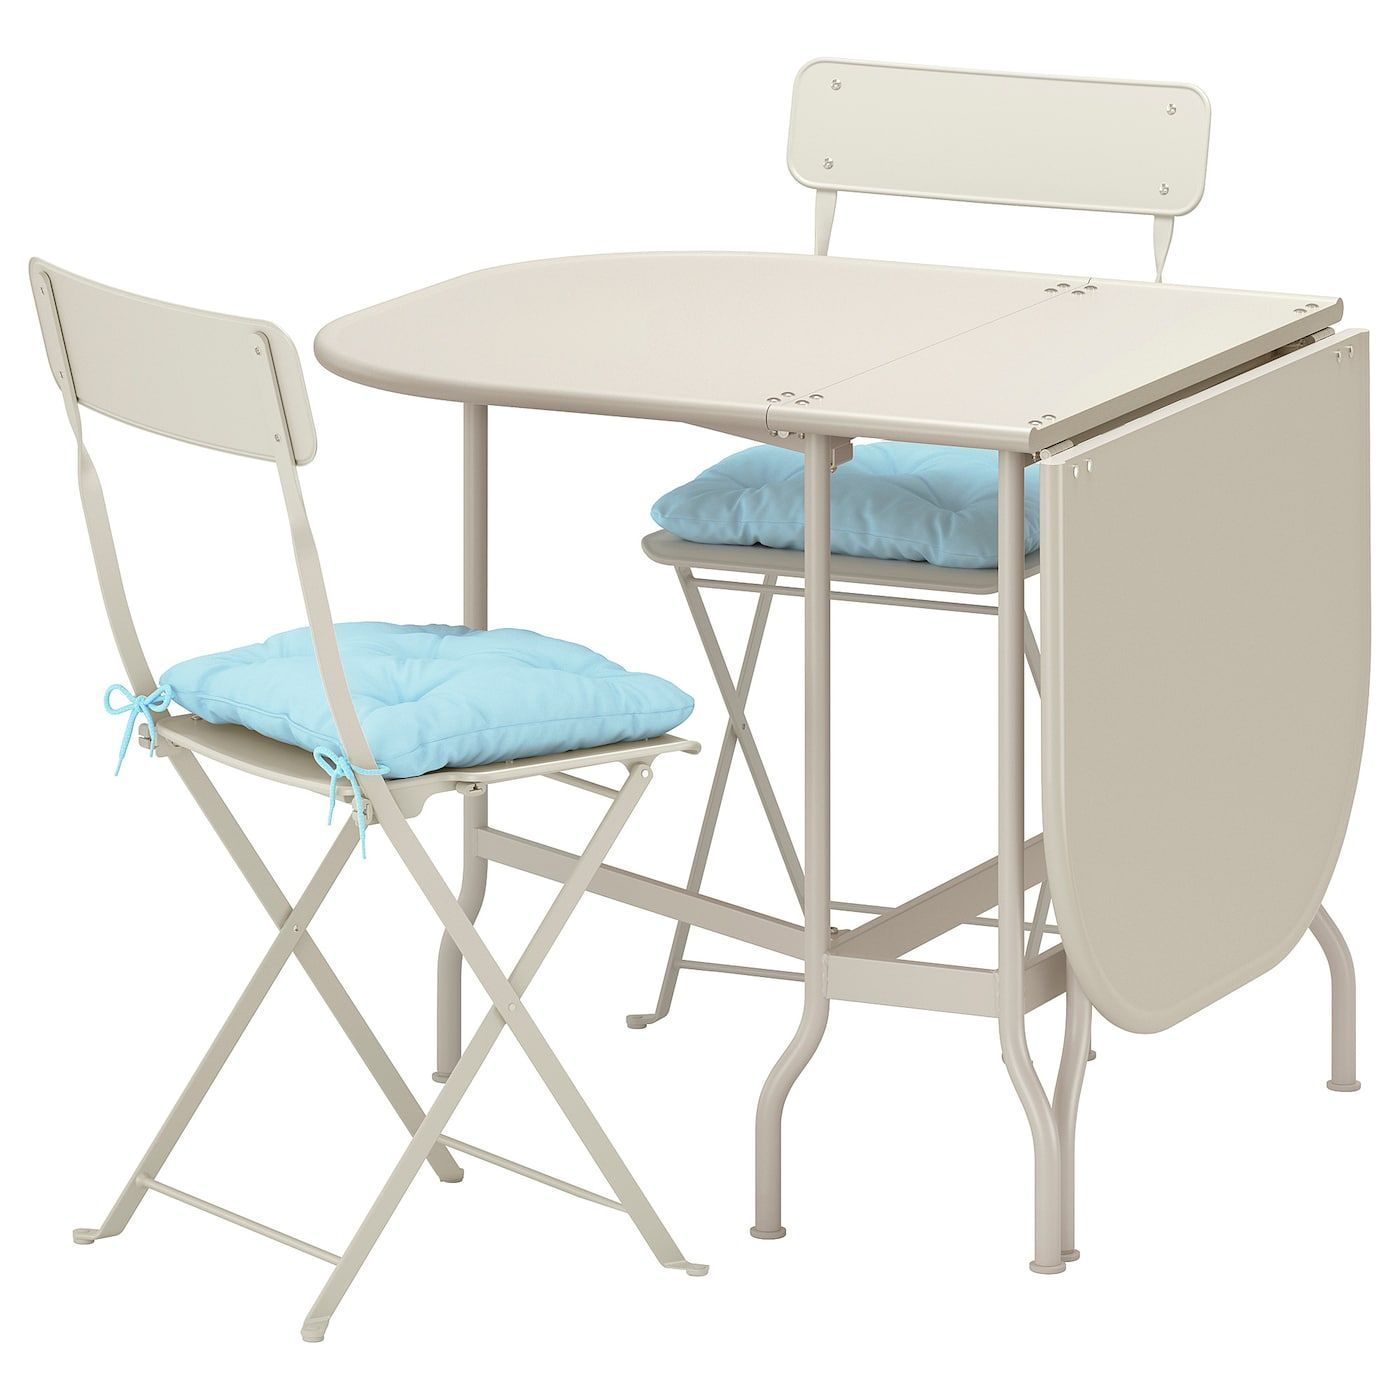 Tavolino Per Balcone Ikea ikea saltholmen beige, kuddarna blue light blue table and 2